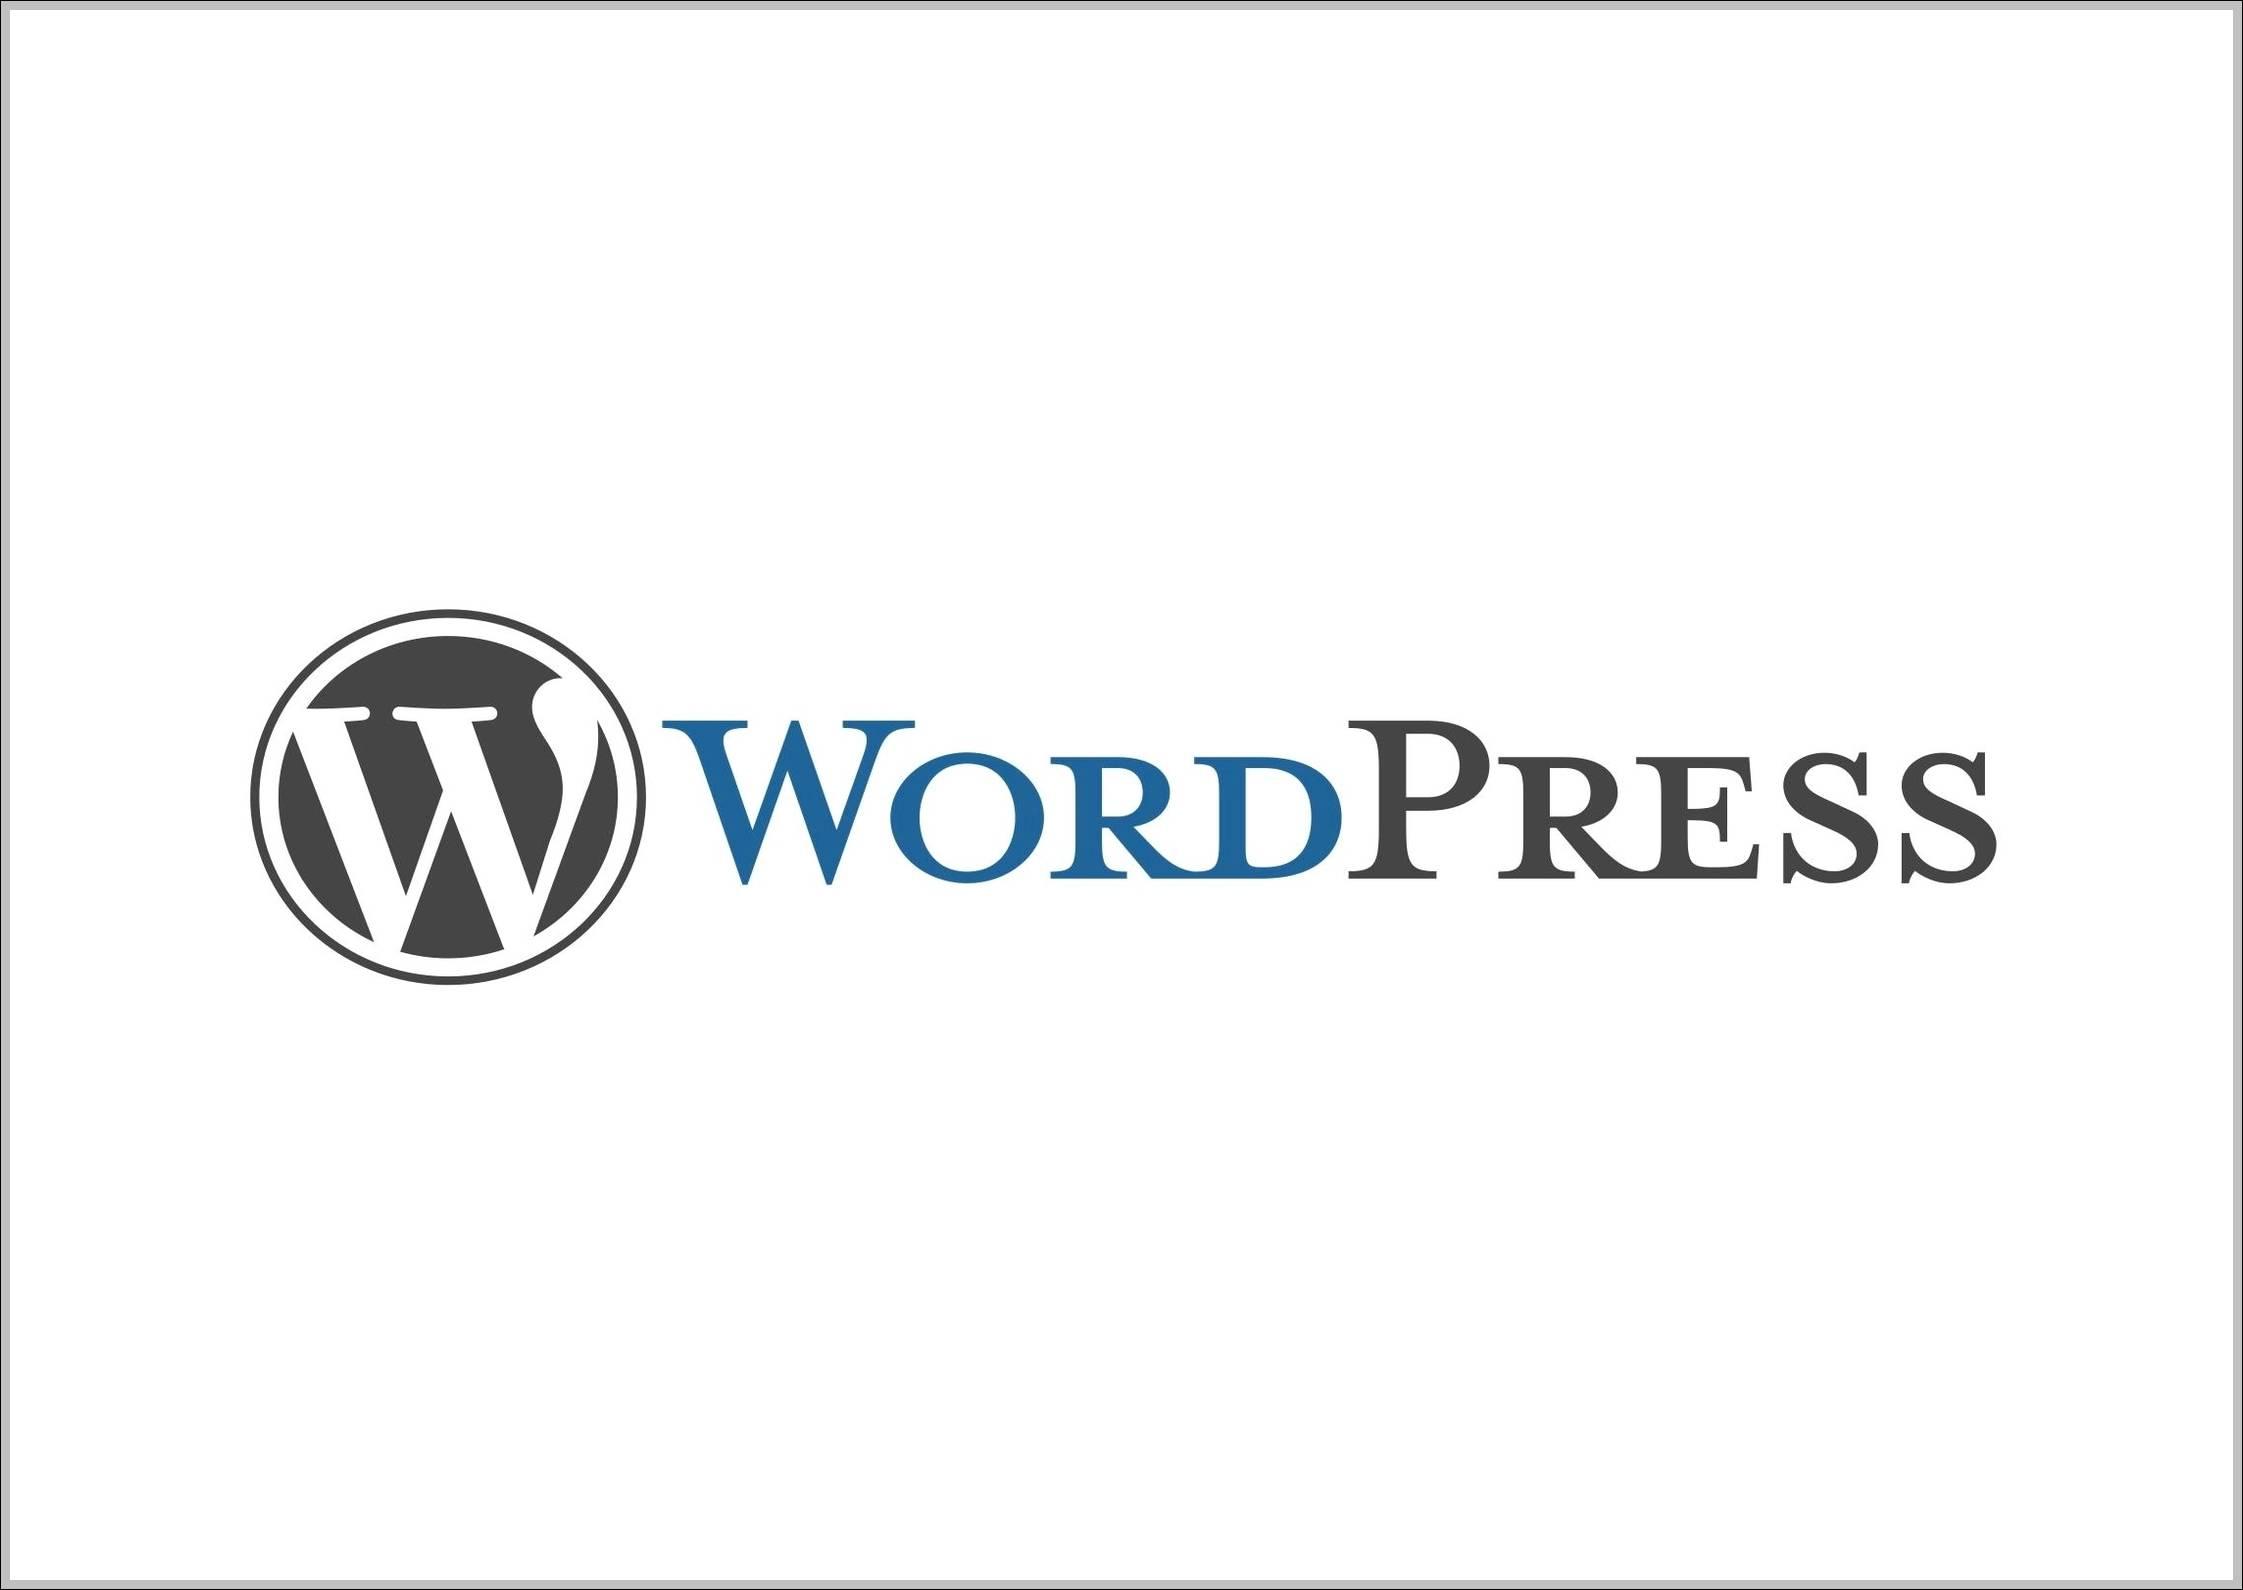 WordPress sign